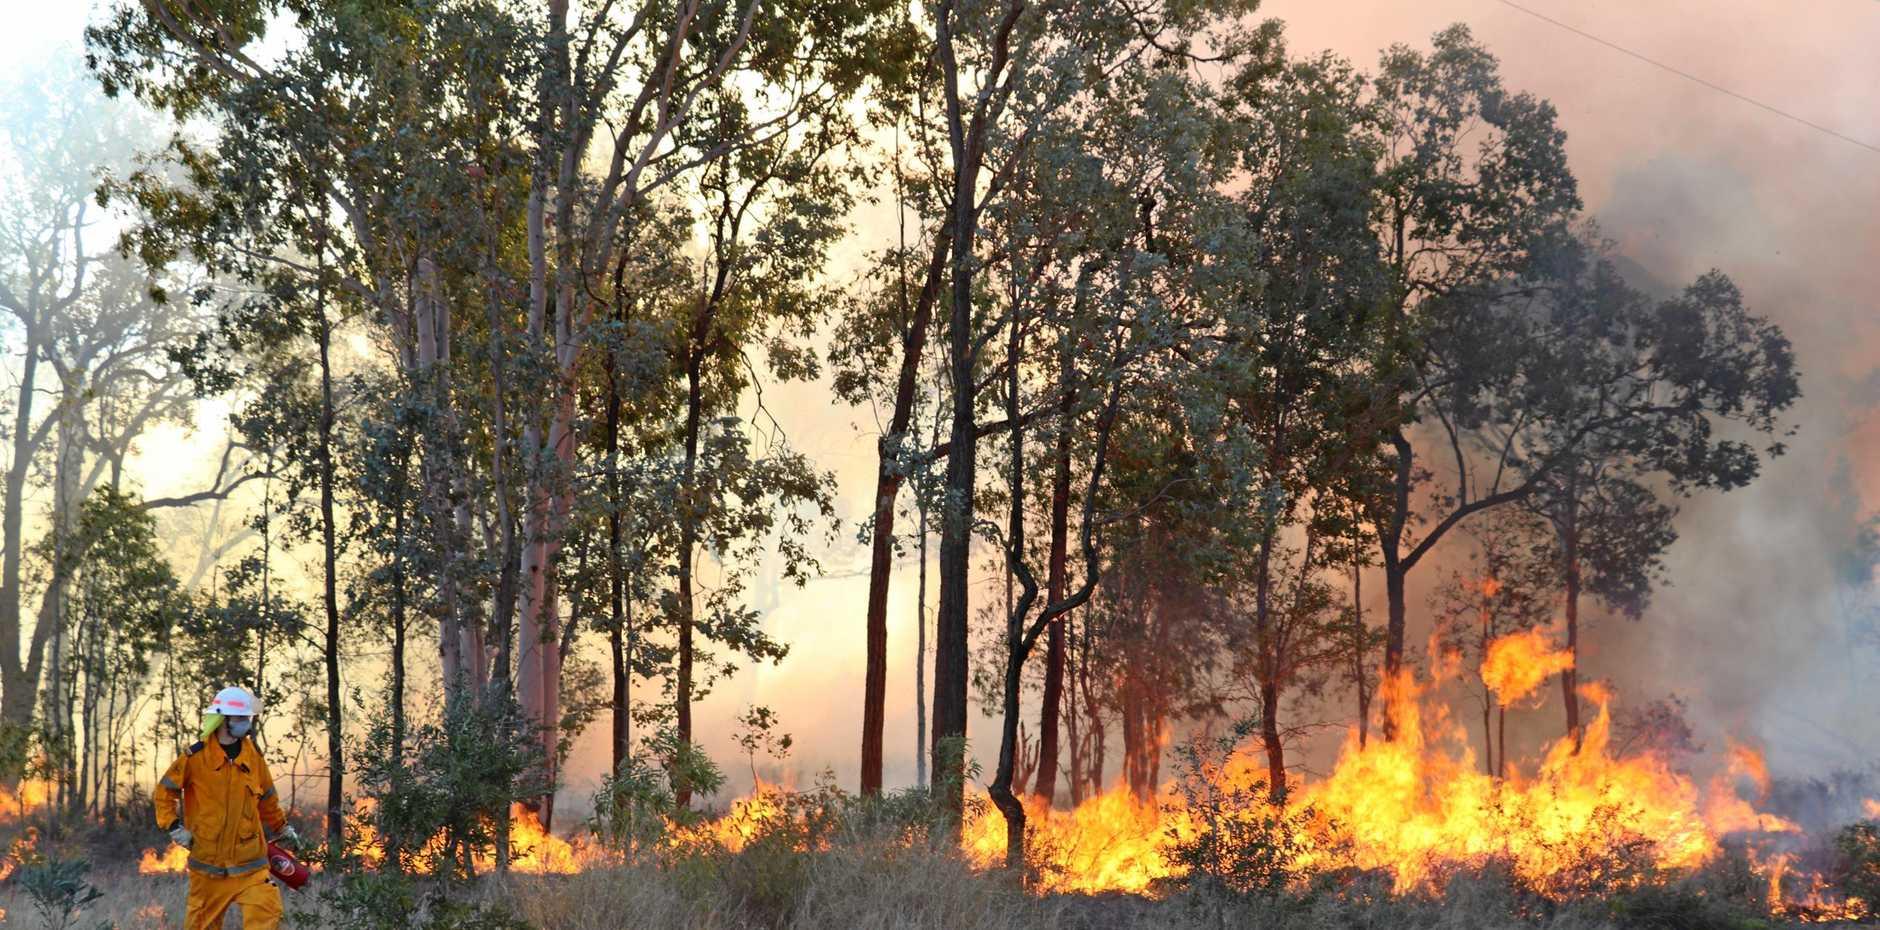 Hazard reduction burn at Emerald Airport on August 3.